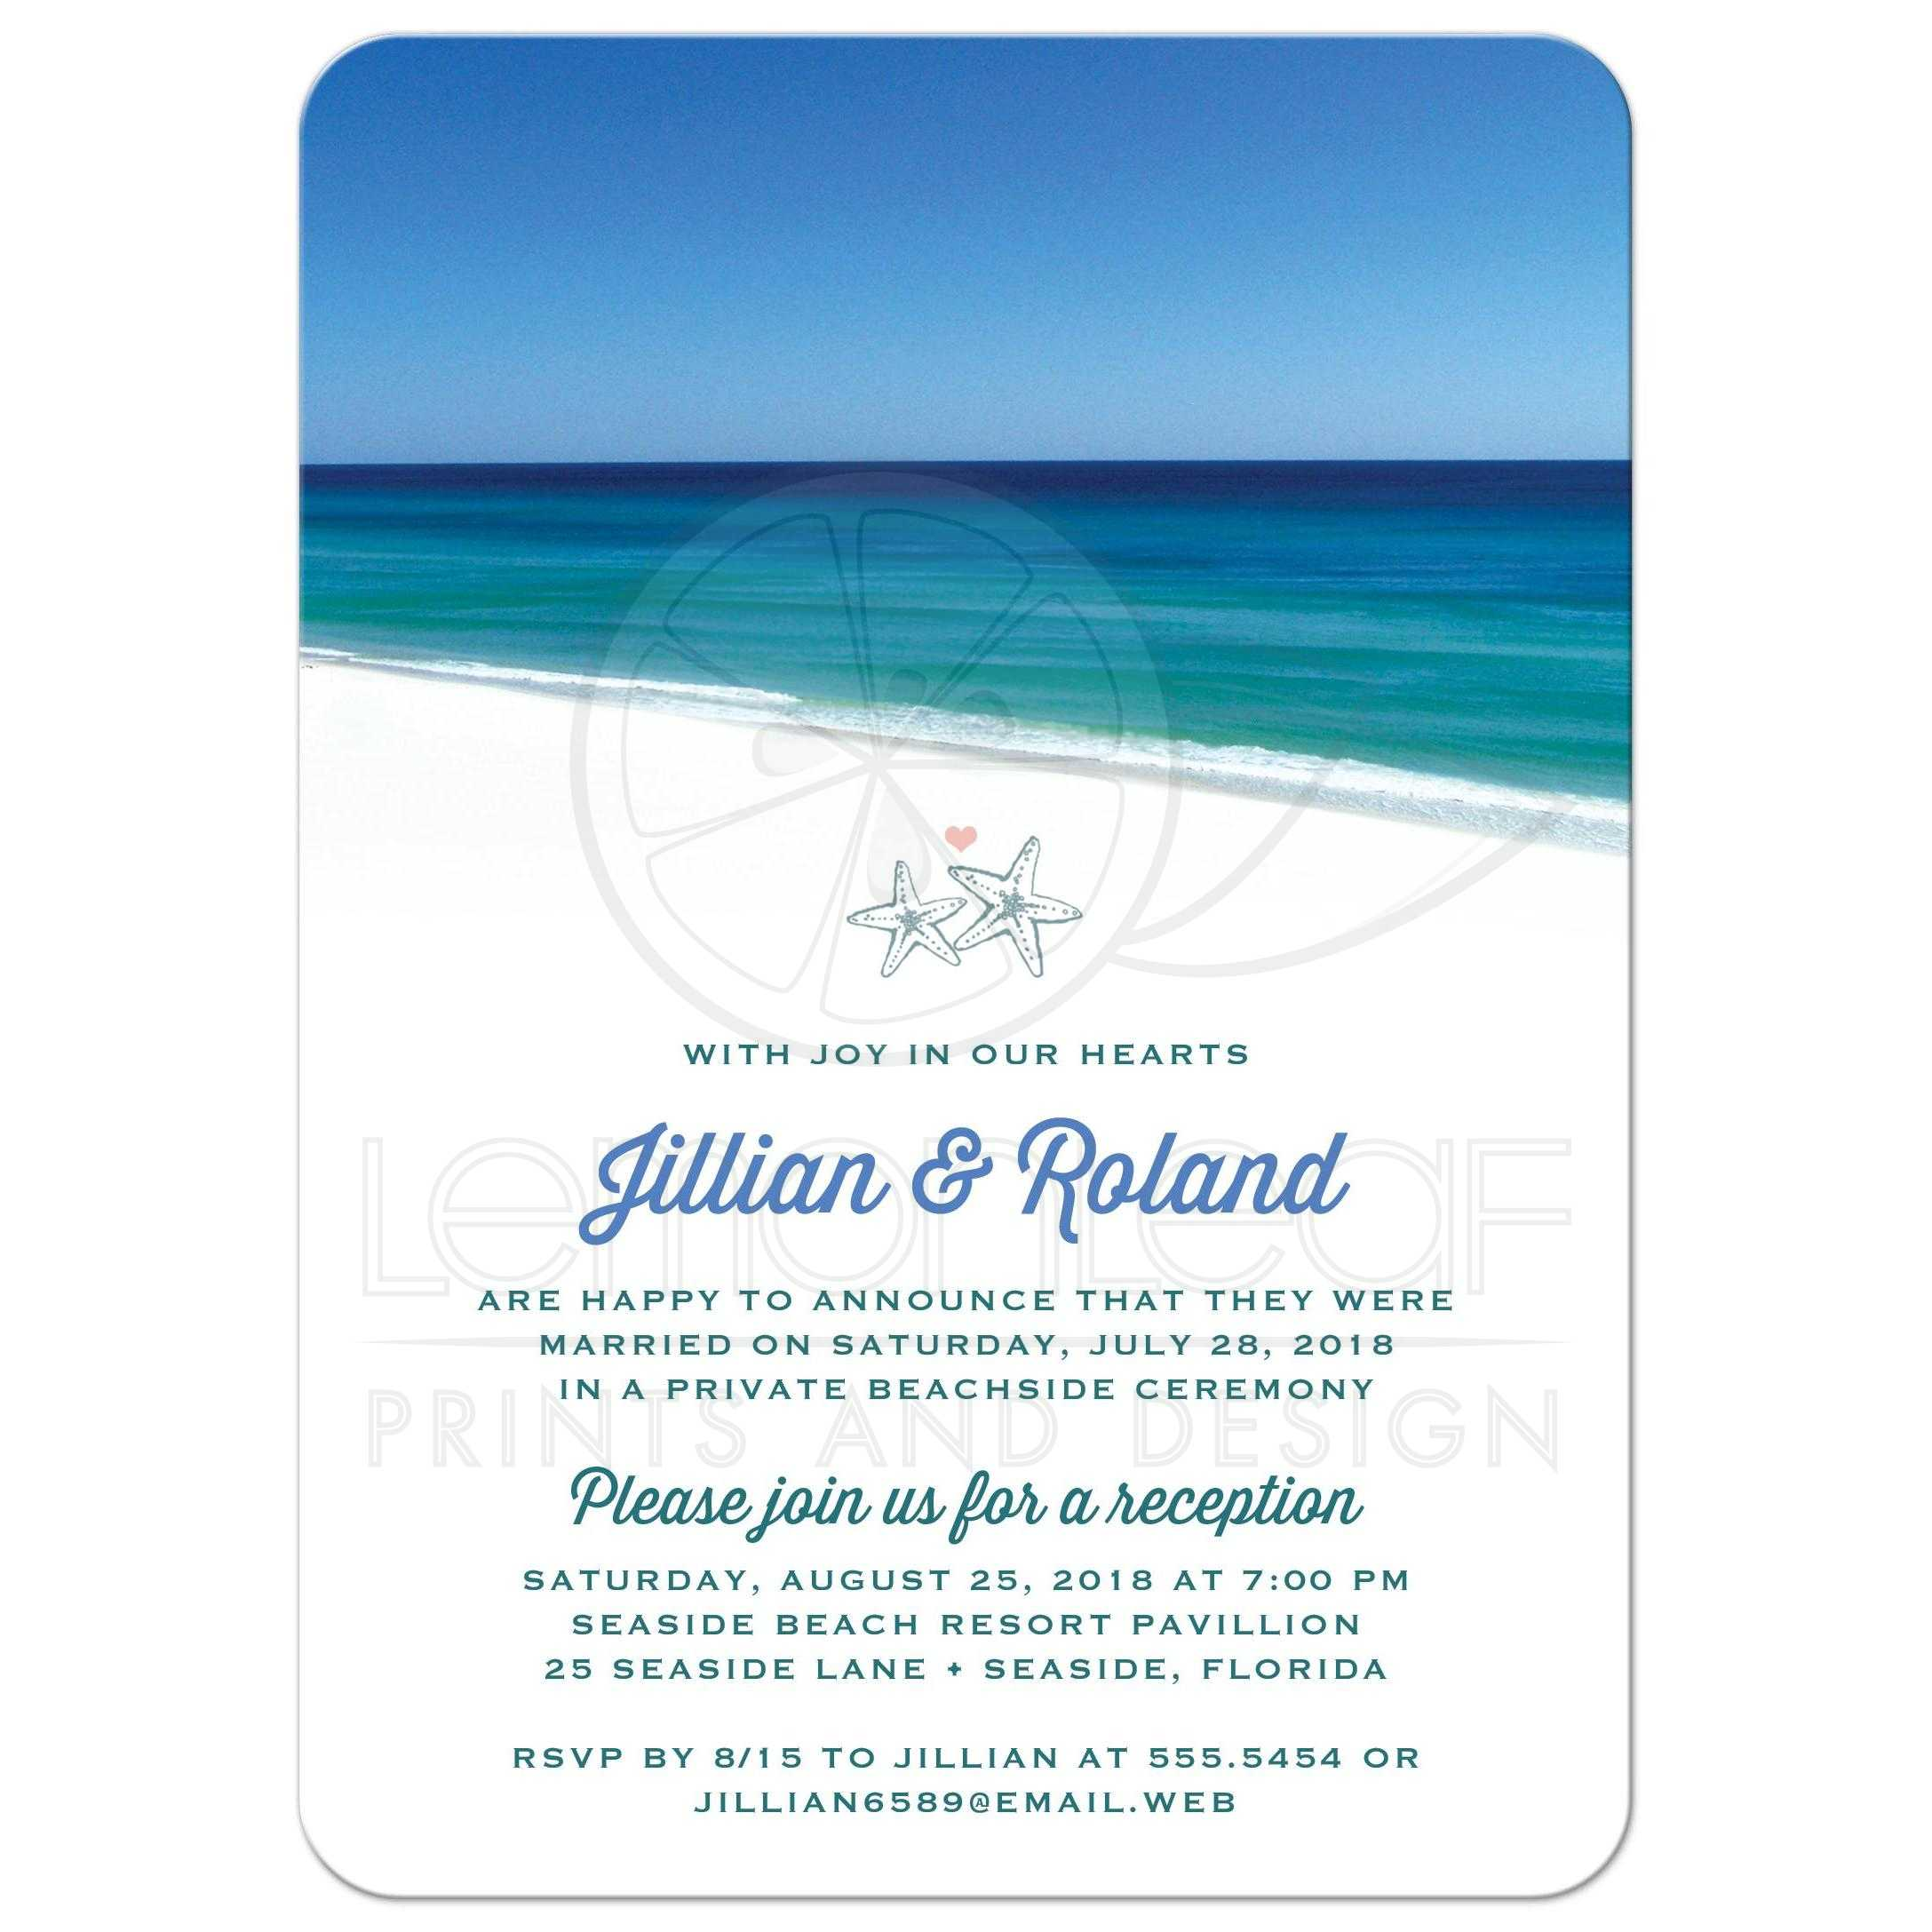 post wedding reception only invitations - beautiful beach scene, Wedding invitations